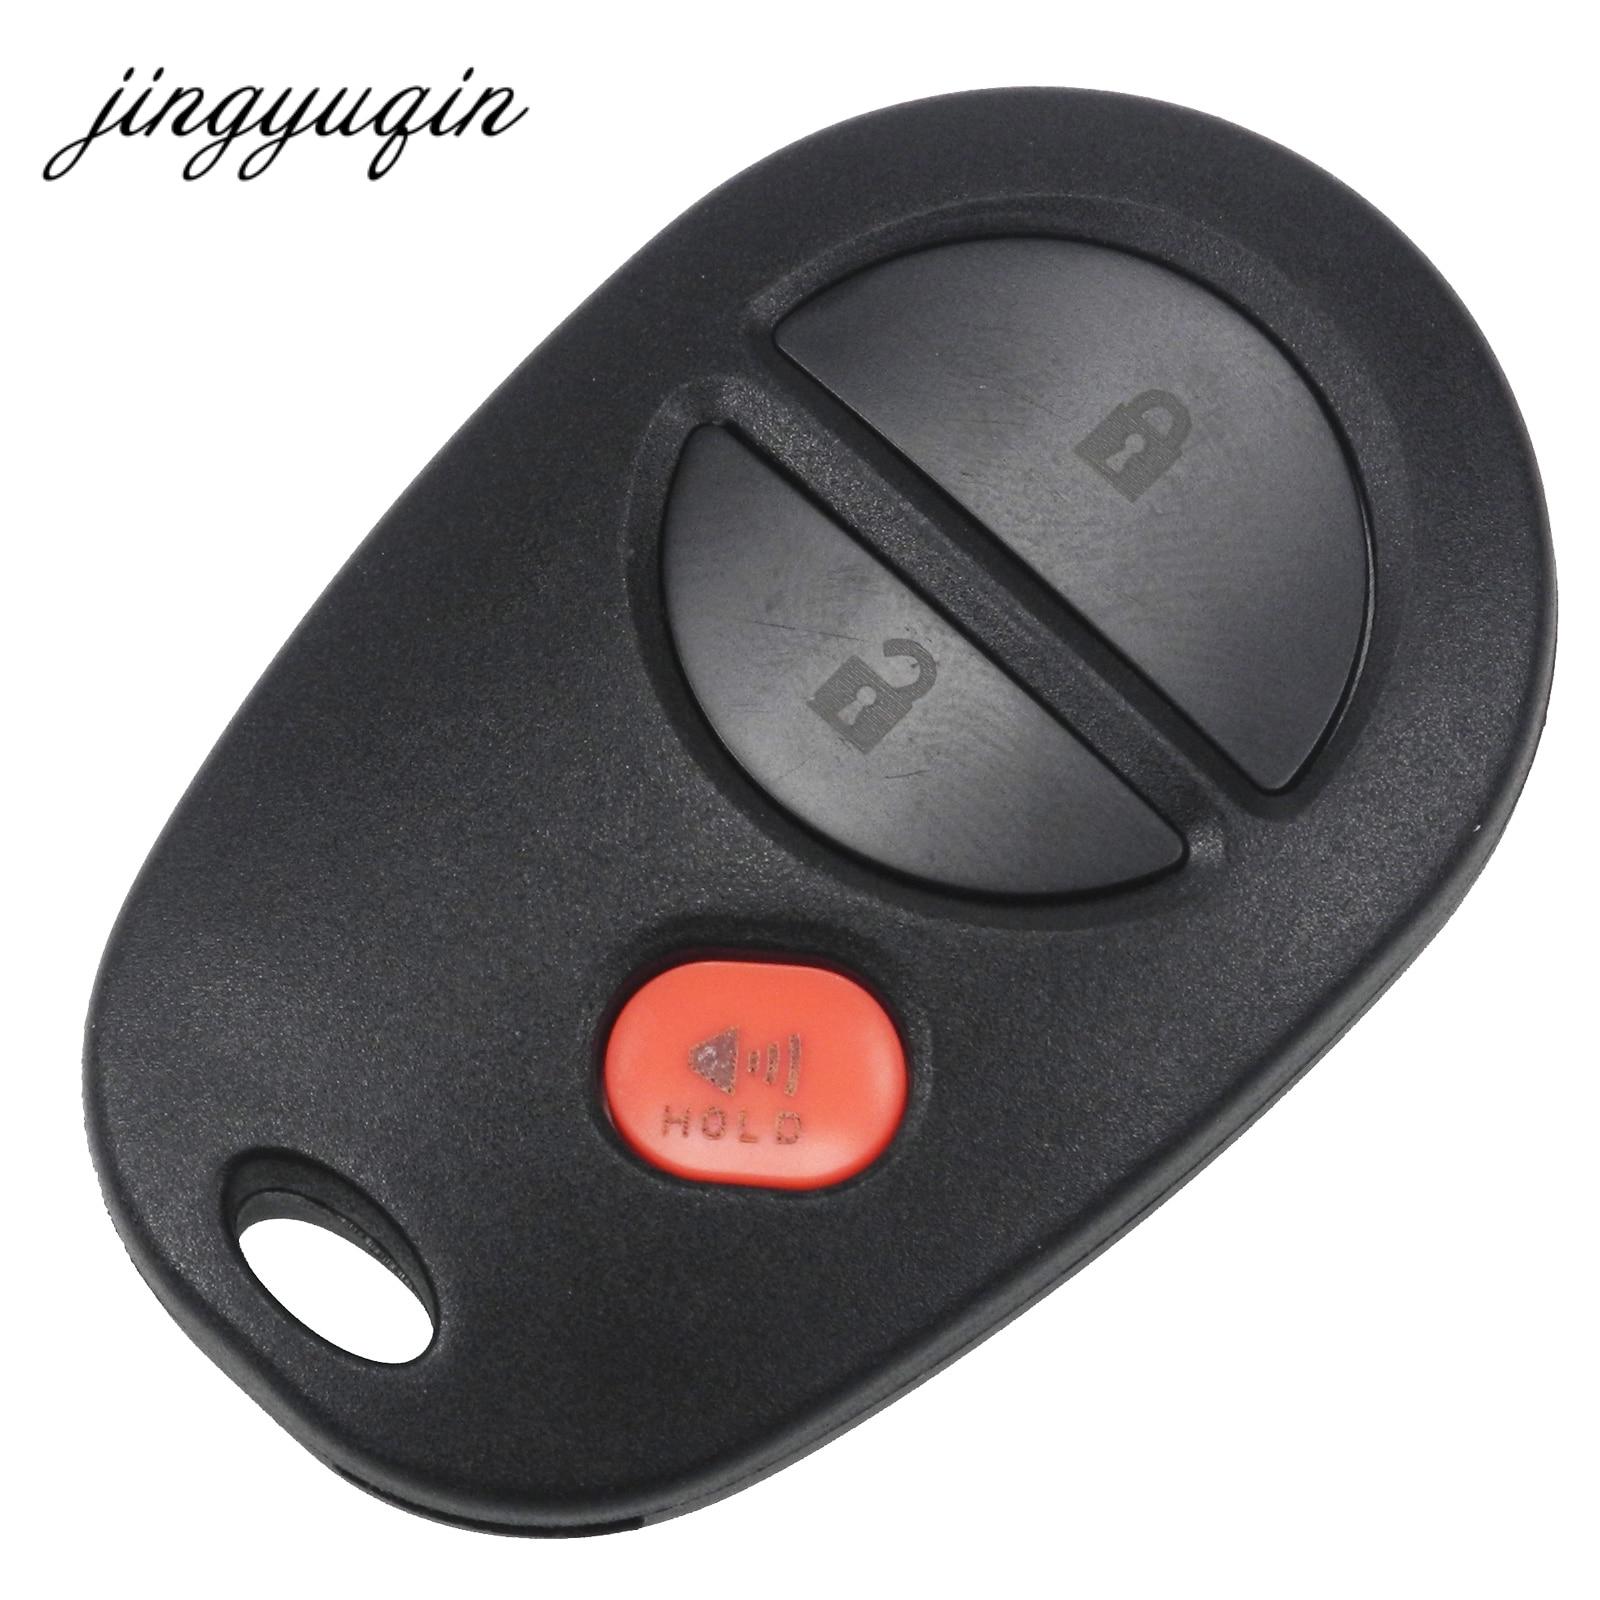 for Toyota RAV4 Highlander Tacom 2013-18 Upgraded H Chip Remote Key Fob GQ4-52T